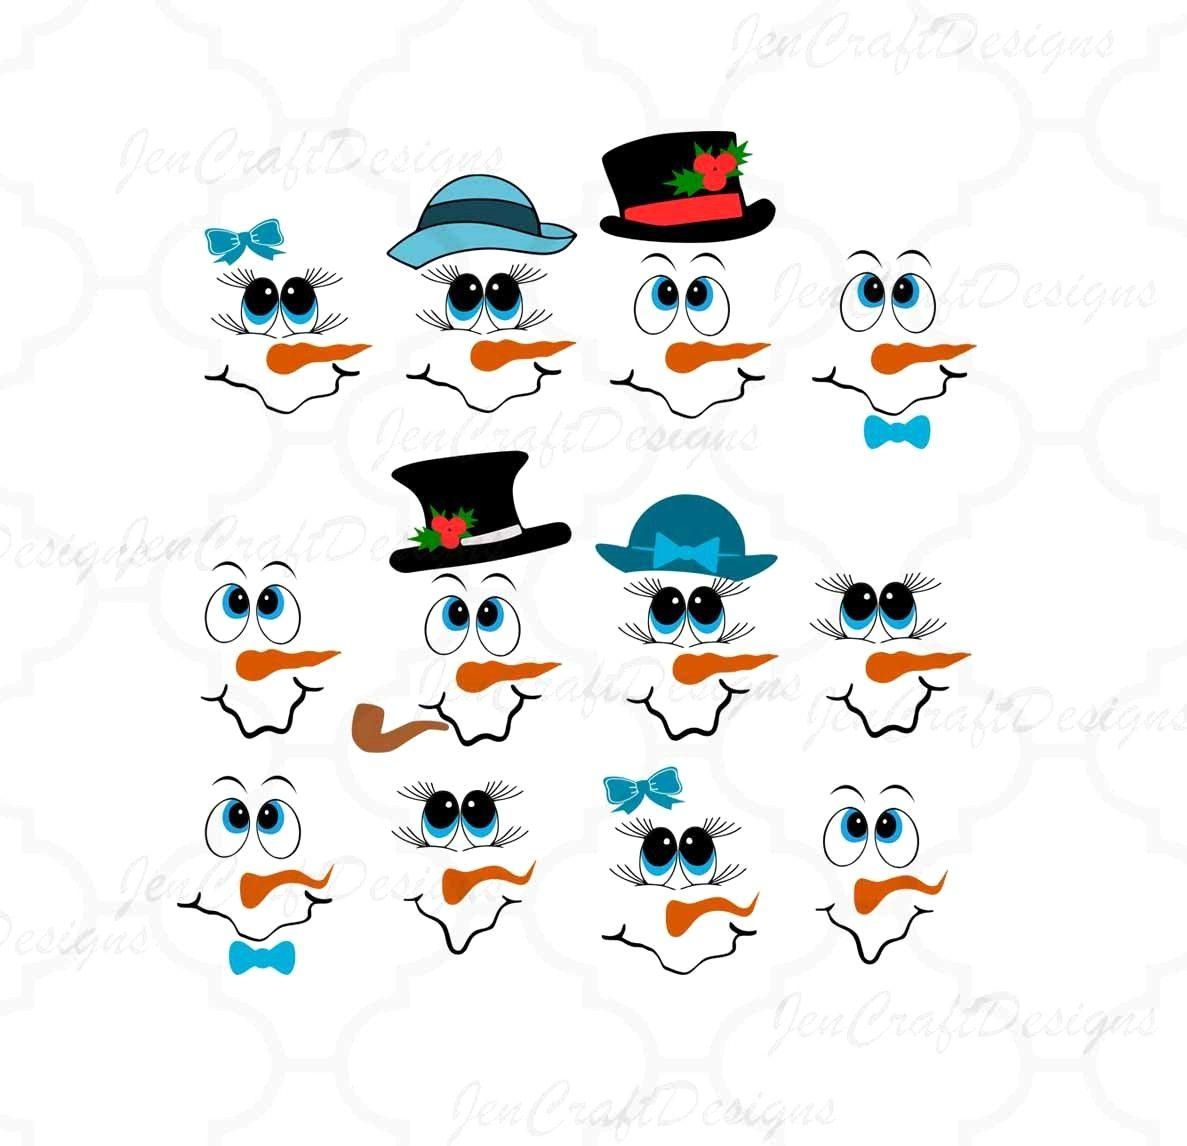 16+ Frosty snowman face clipart ideas